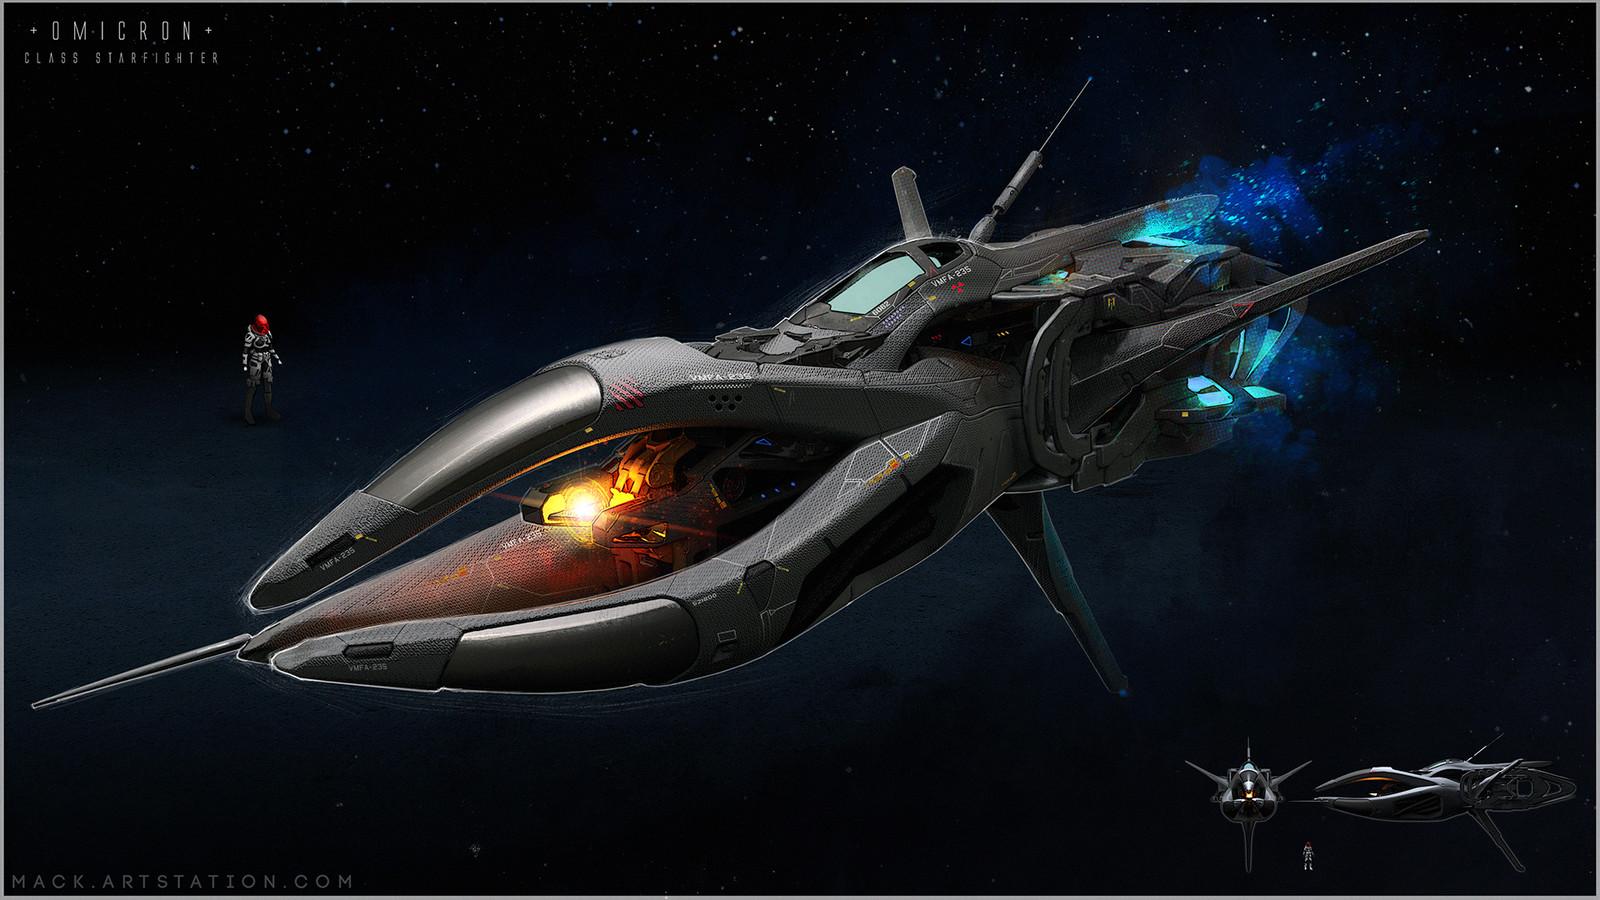 Omicron Starfighter